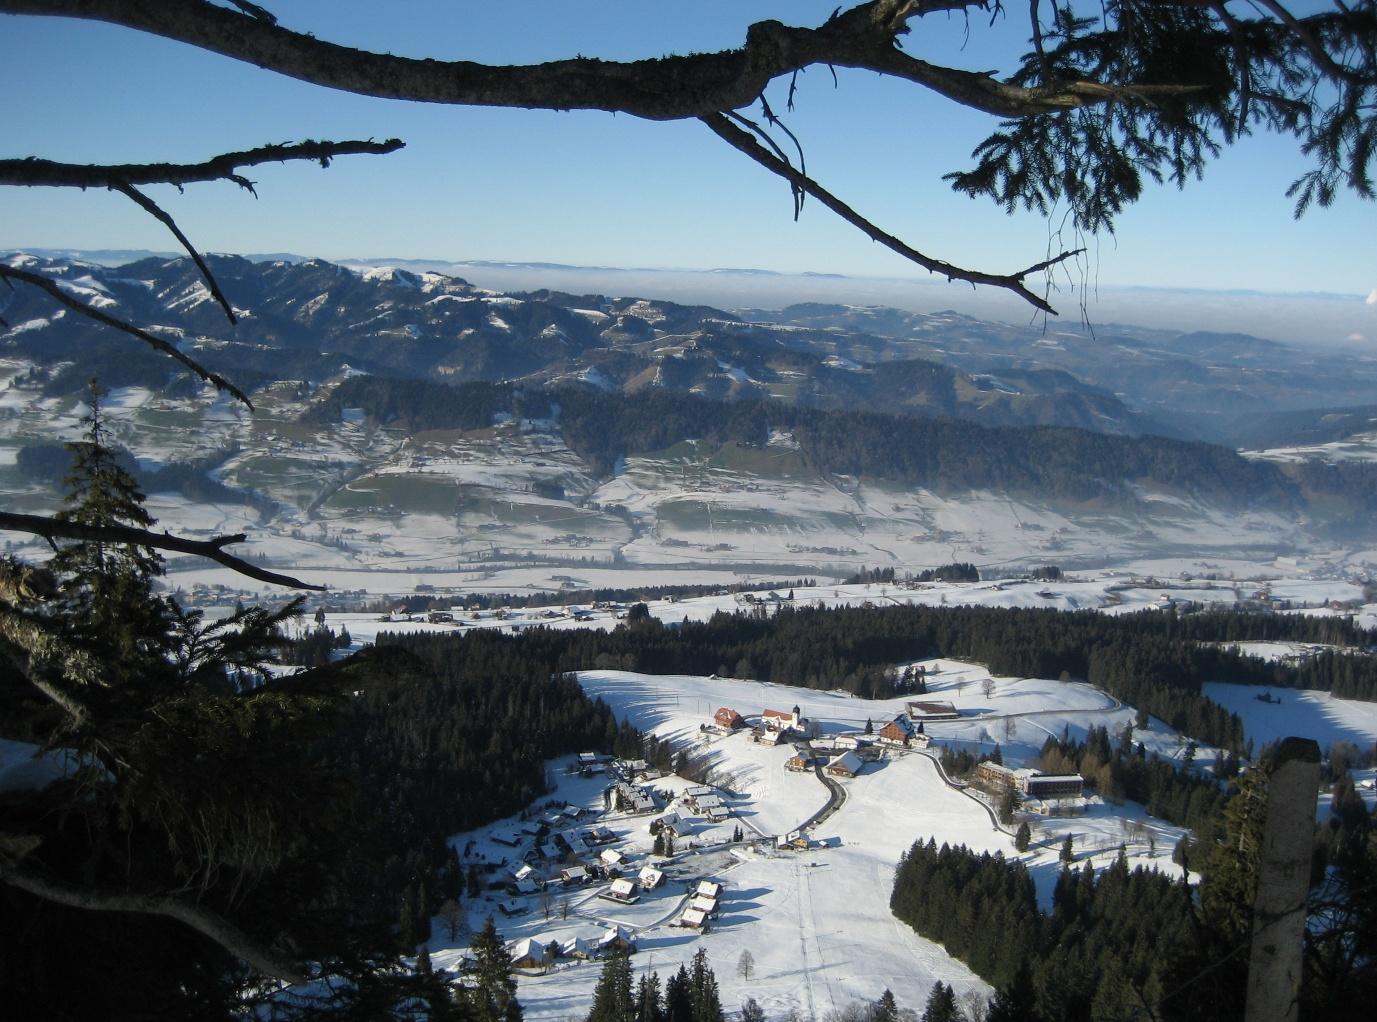 Heiligkreuz - Reistegg - First